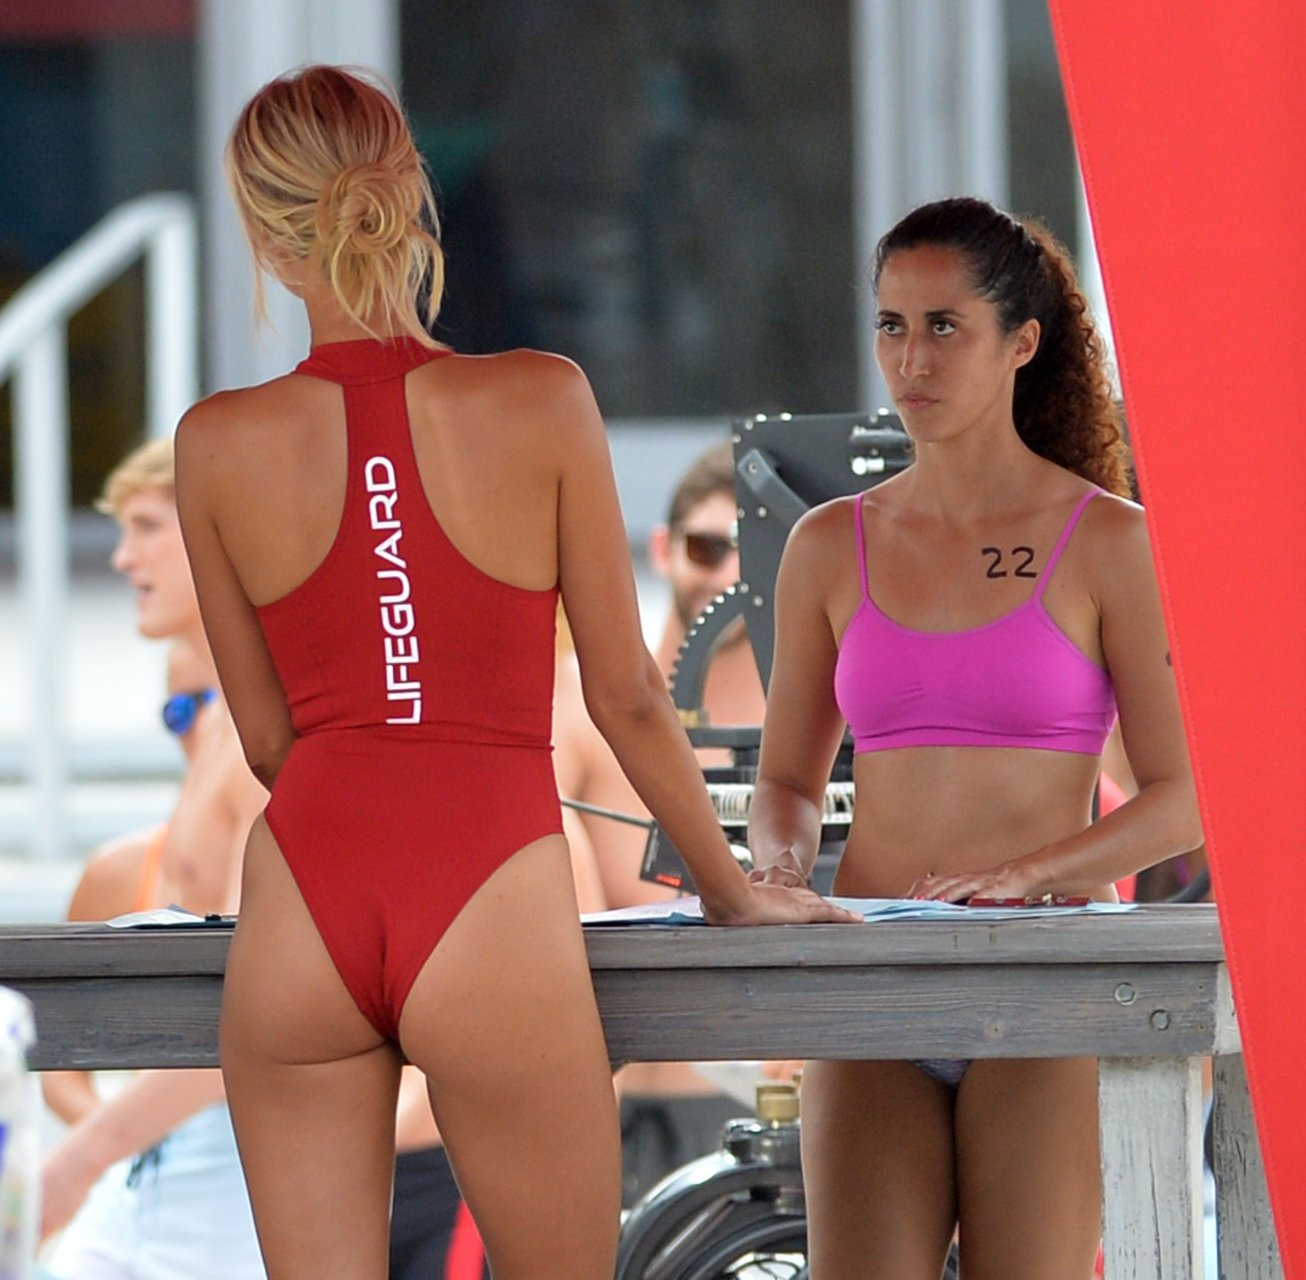 Alexandra daddario san andreas bikini - 2 part 9